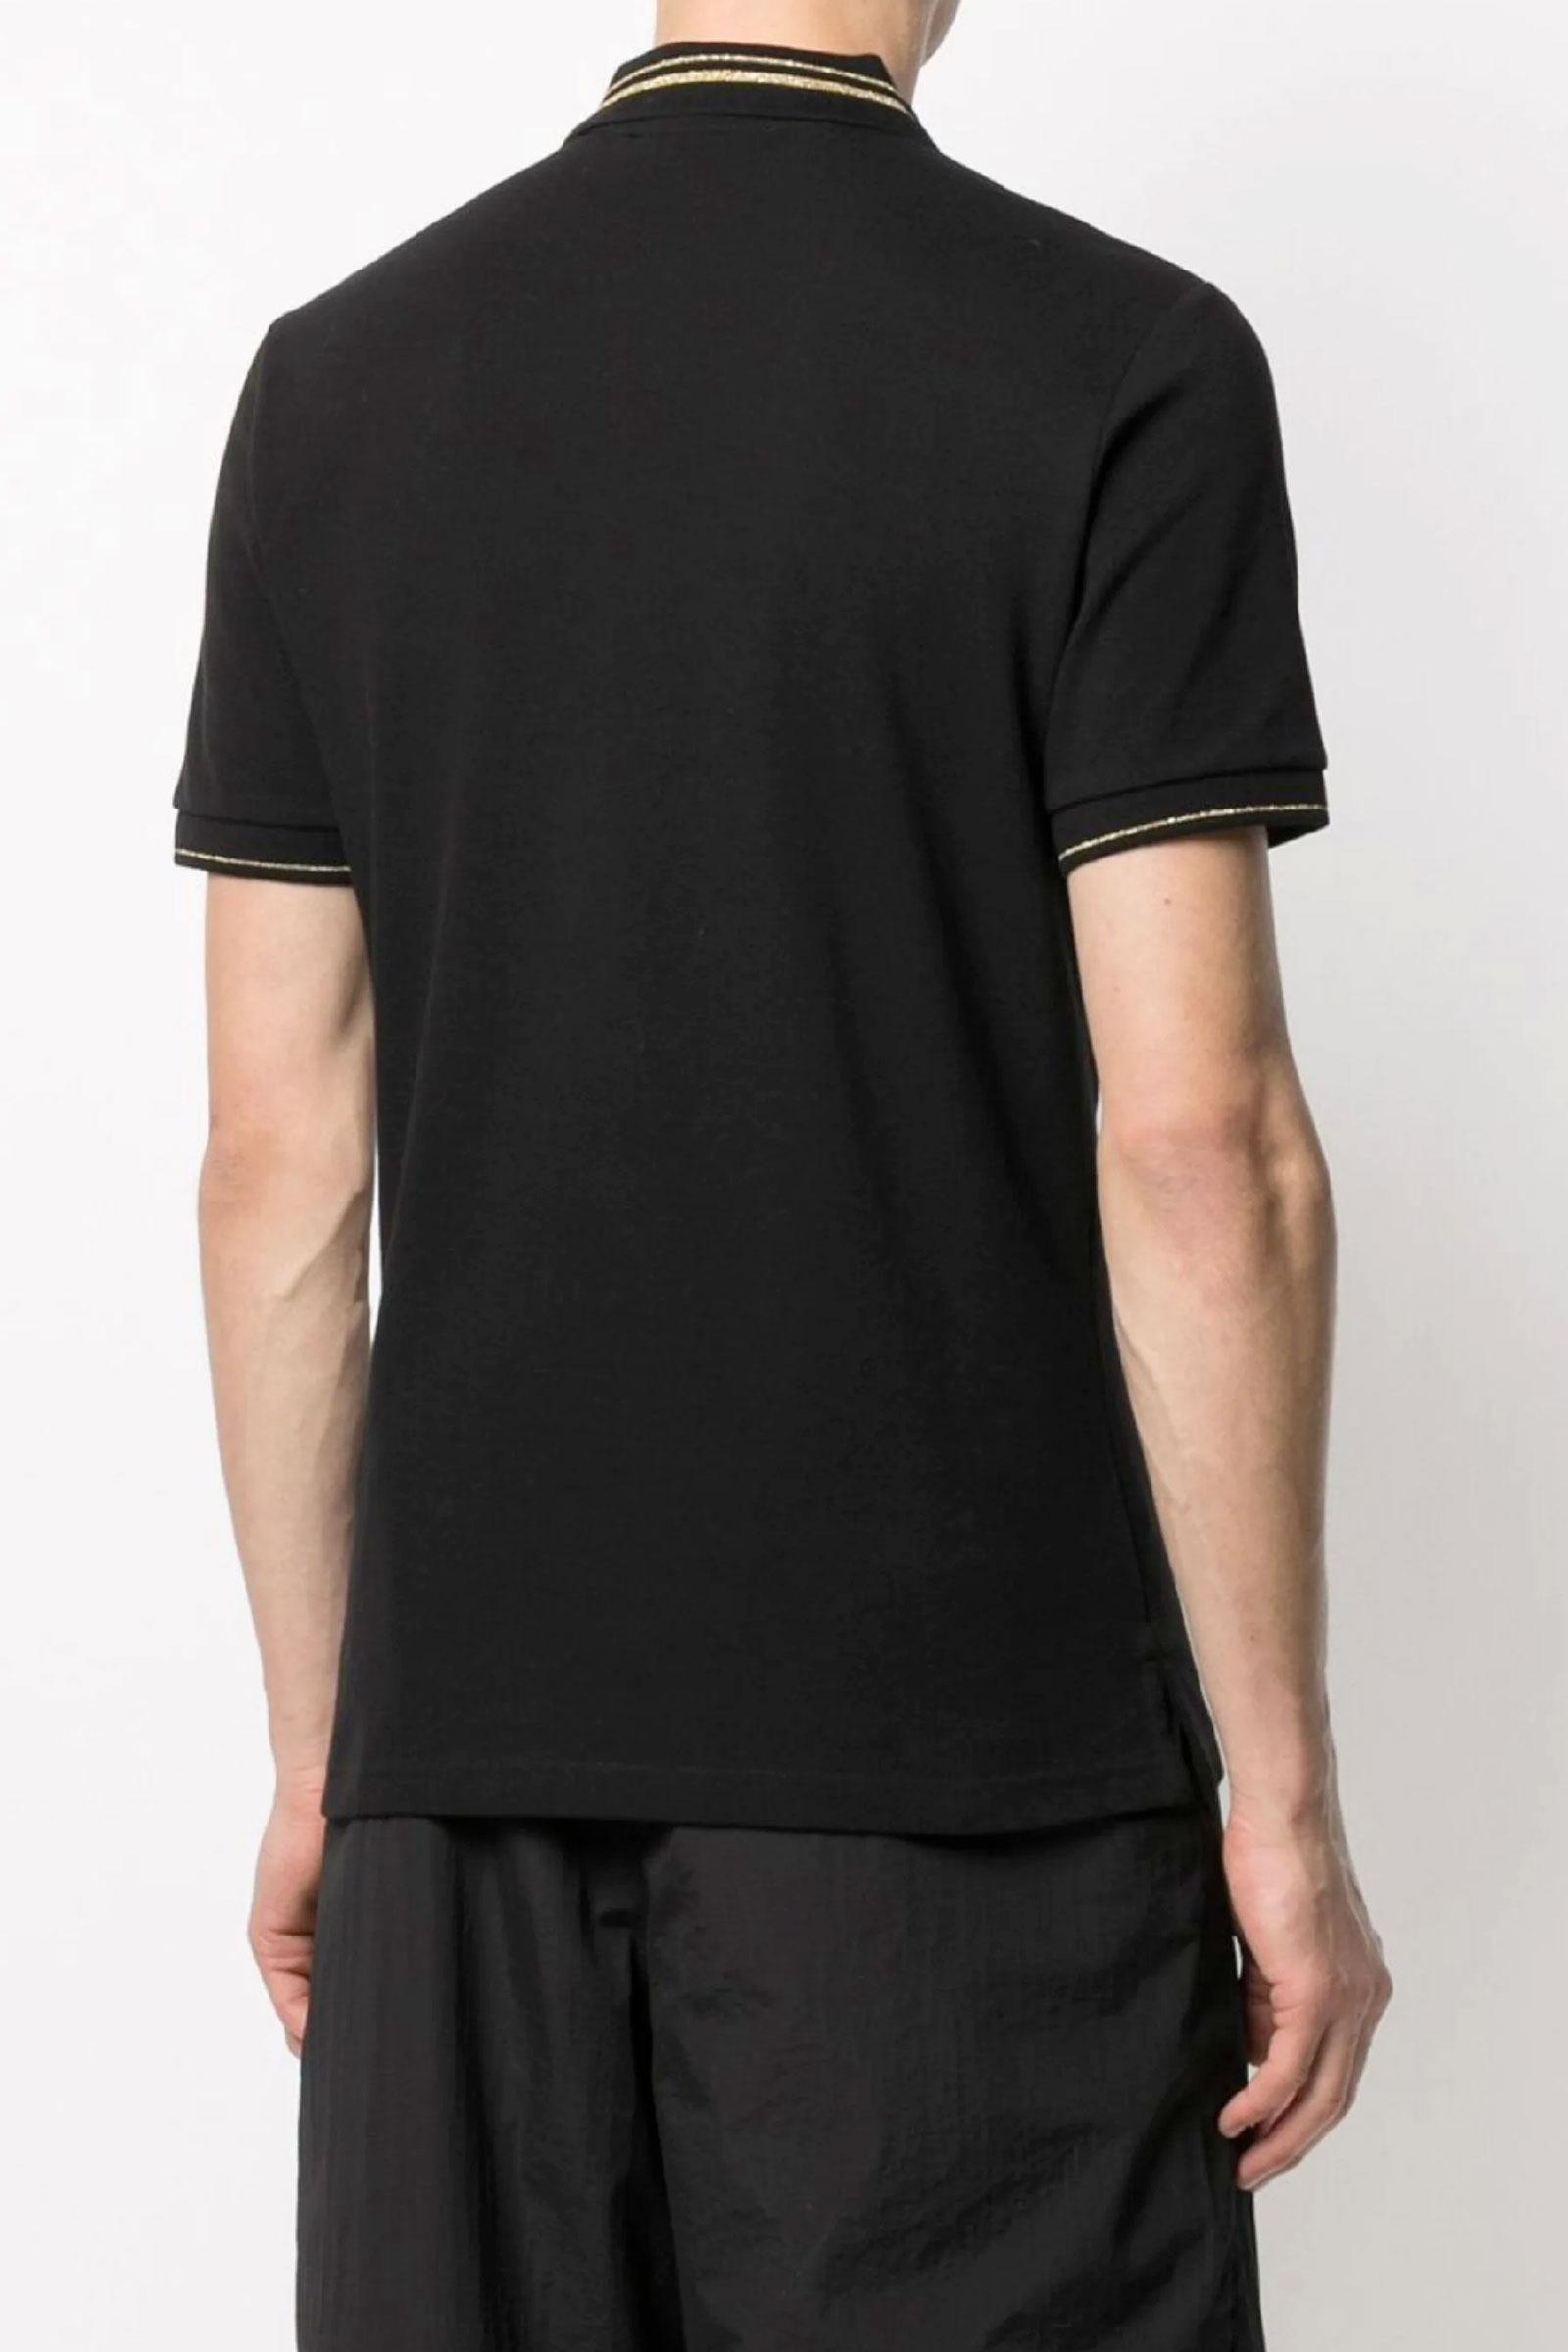 VERSACE JEANS COUTURE Men's polo shirt VERSACE JEANS COUTURE | T-Shirt | B3GWA7T336571K42